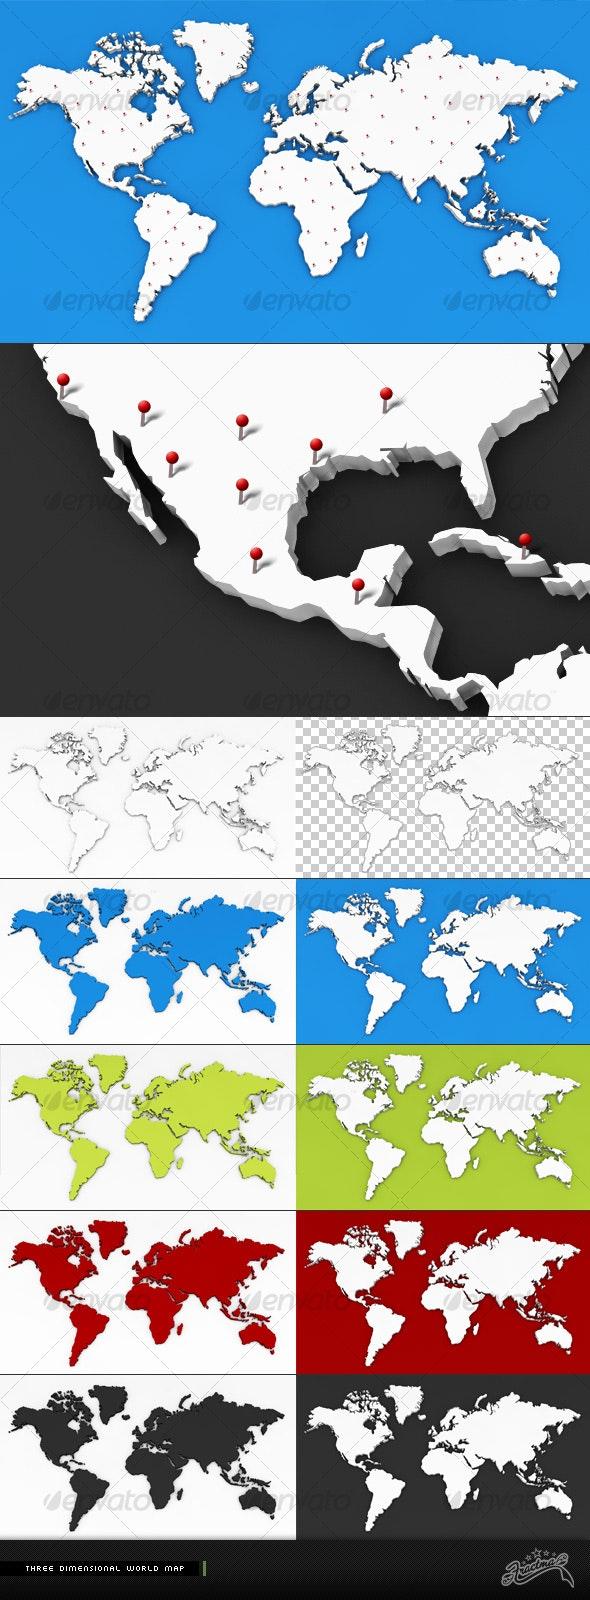 3D World Map - 3D Renders Graphics